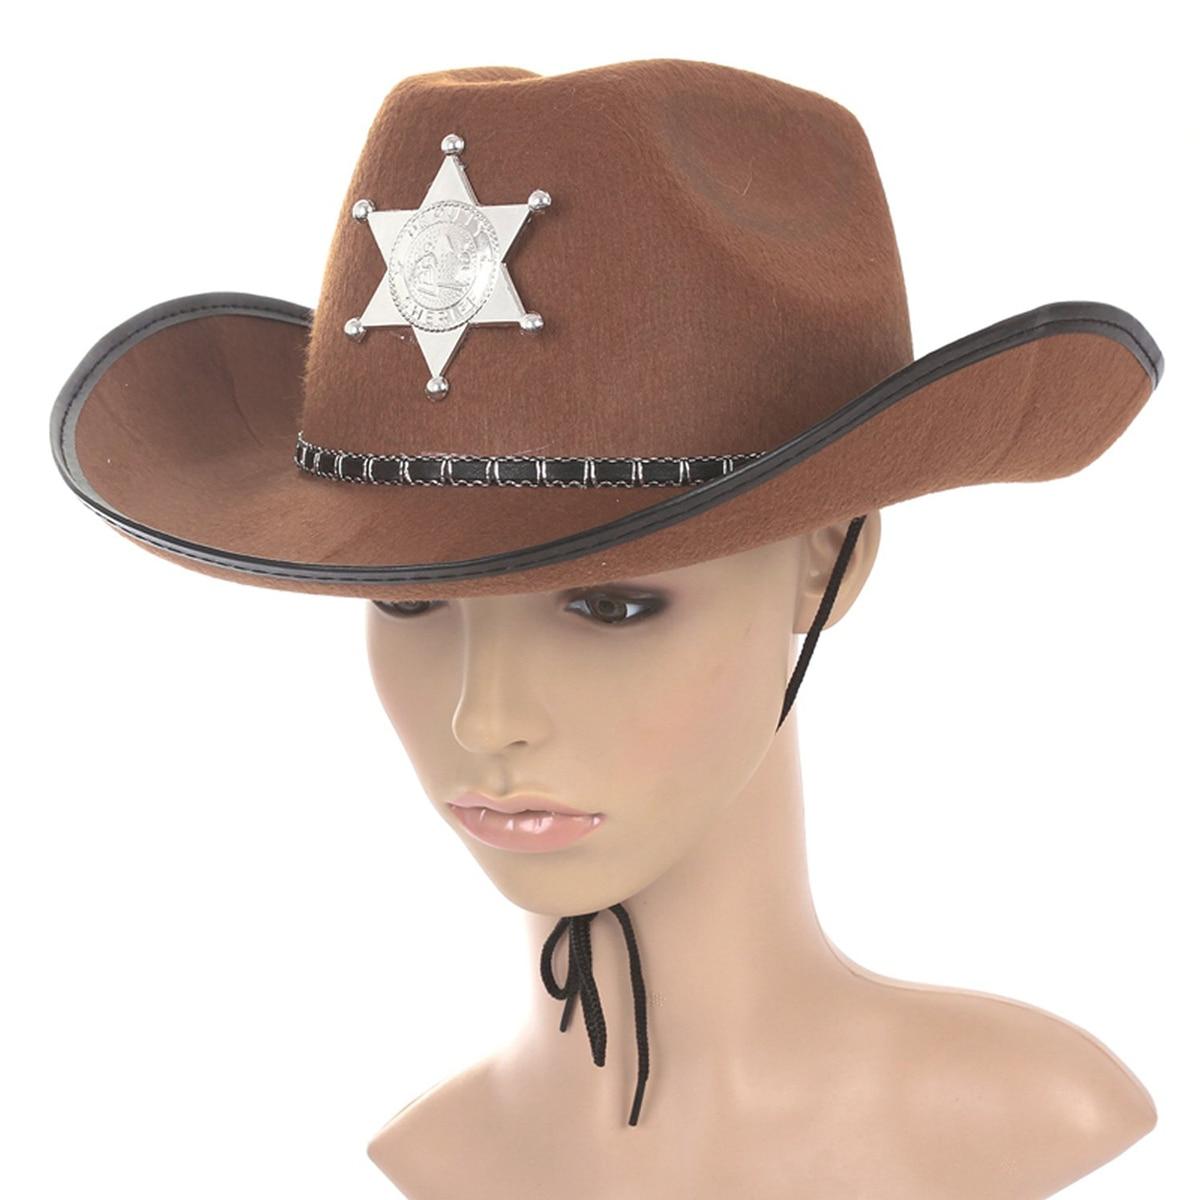 1   Cowboy Western Wild West Sheriff Hat Fancy Dress Halloween Party Costume  (Brown) 1eaa307e5385